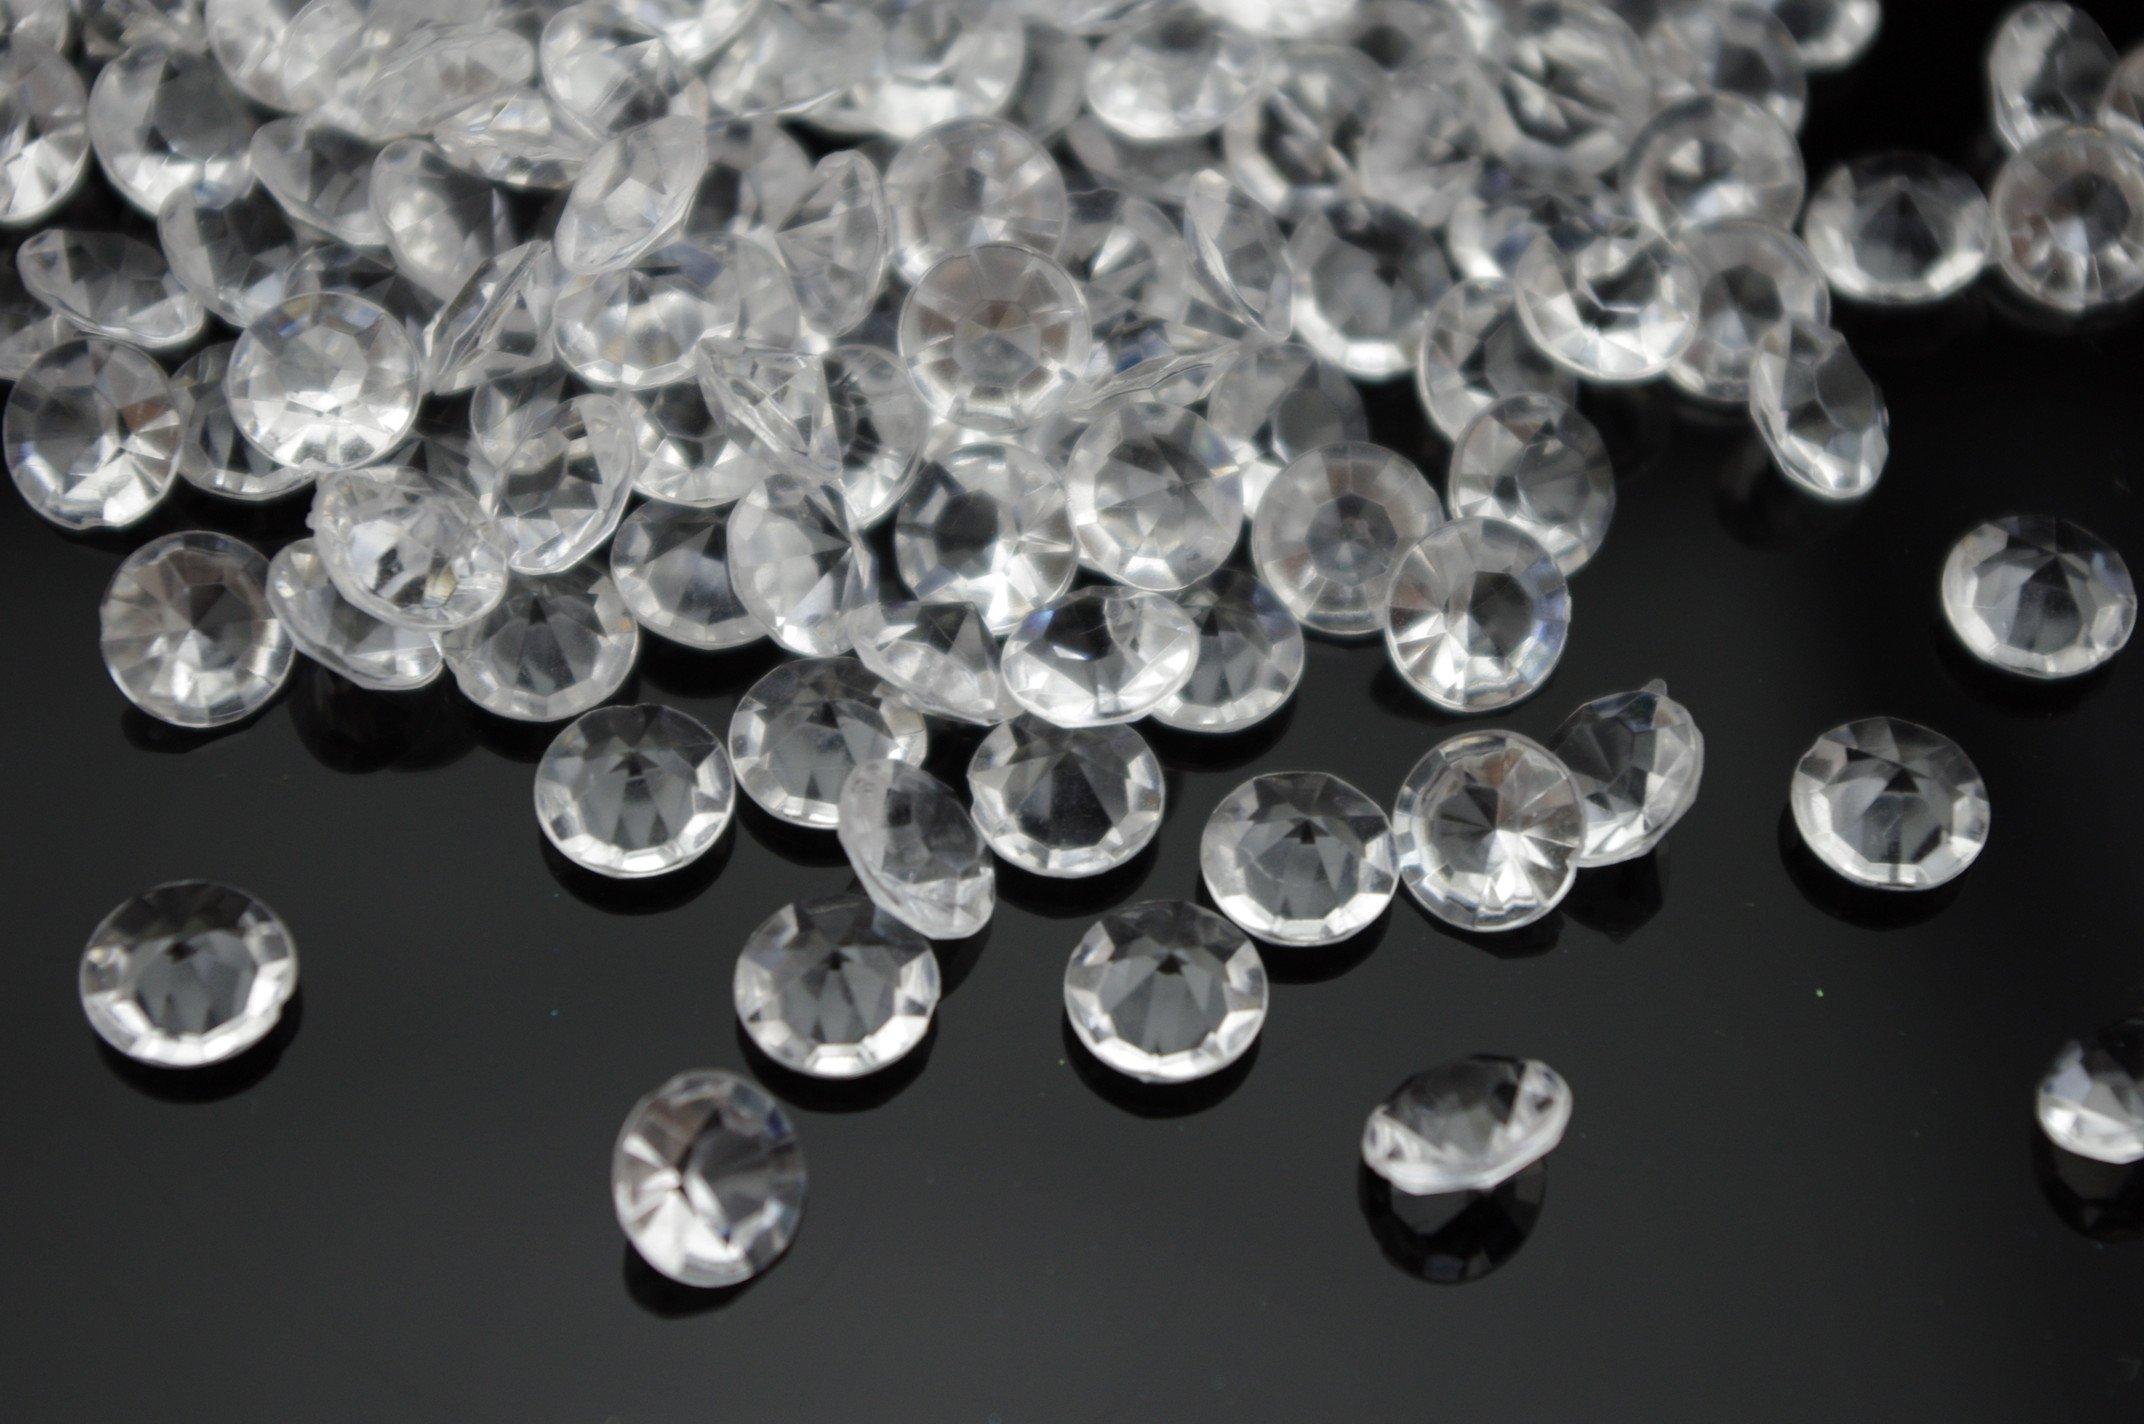 AEAOA 2000 Acrylic Diamond 4 Carat 10mm Table Confetti Wedding Bridal Shower Party Decorations (Clear)